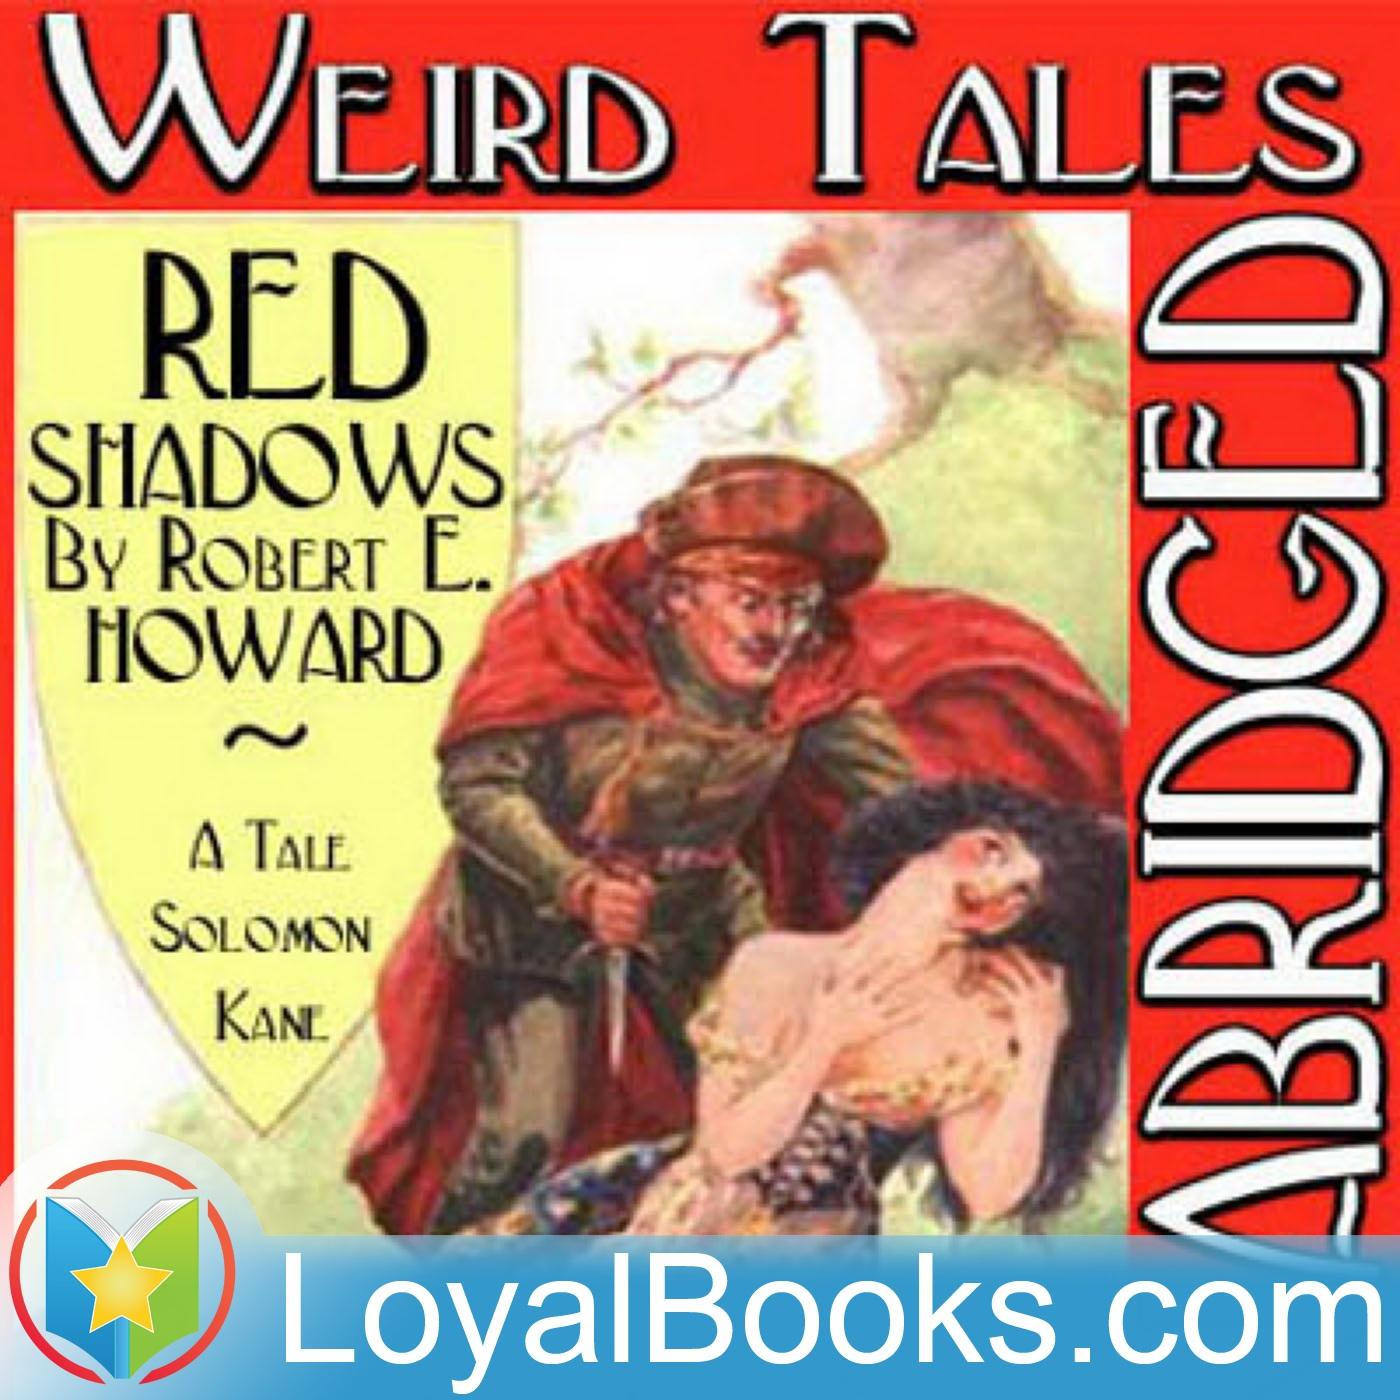 <![CDATA[Red Shadows by Robert Ervin Howard]]>